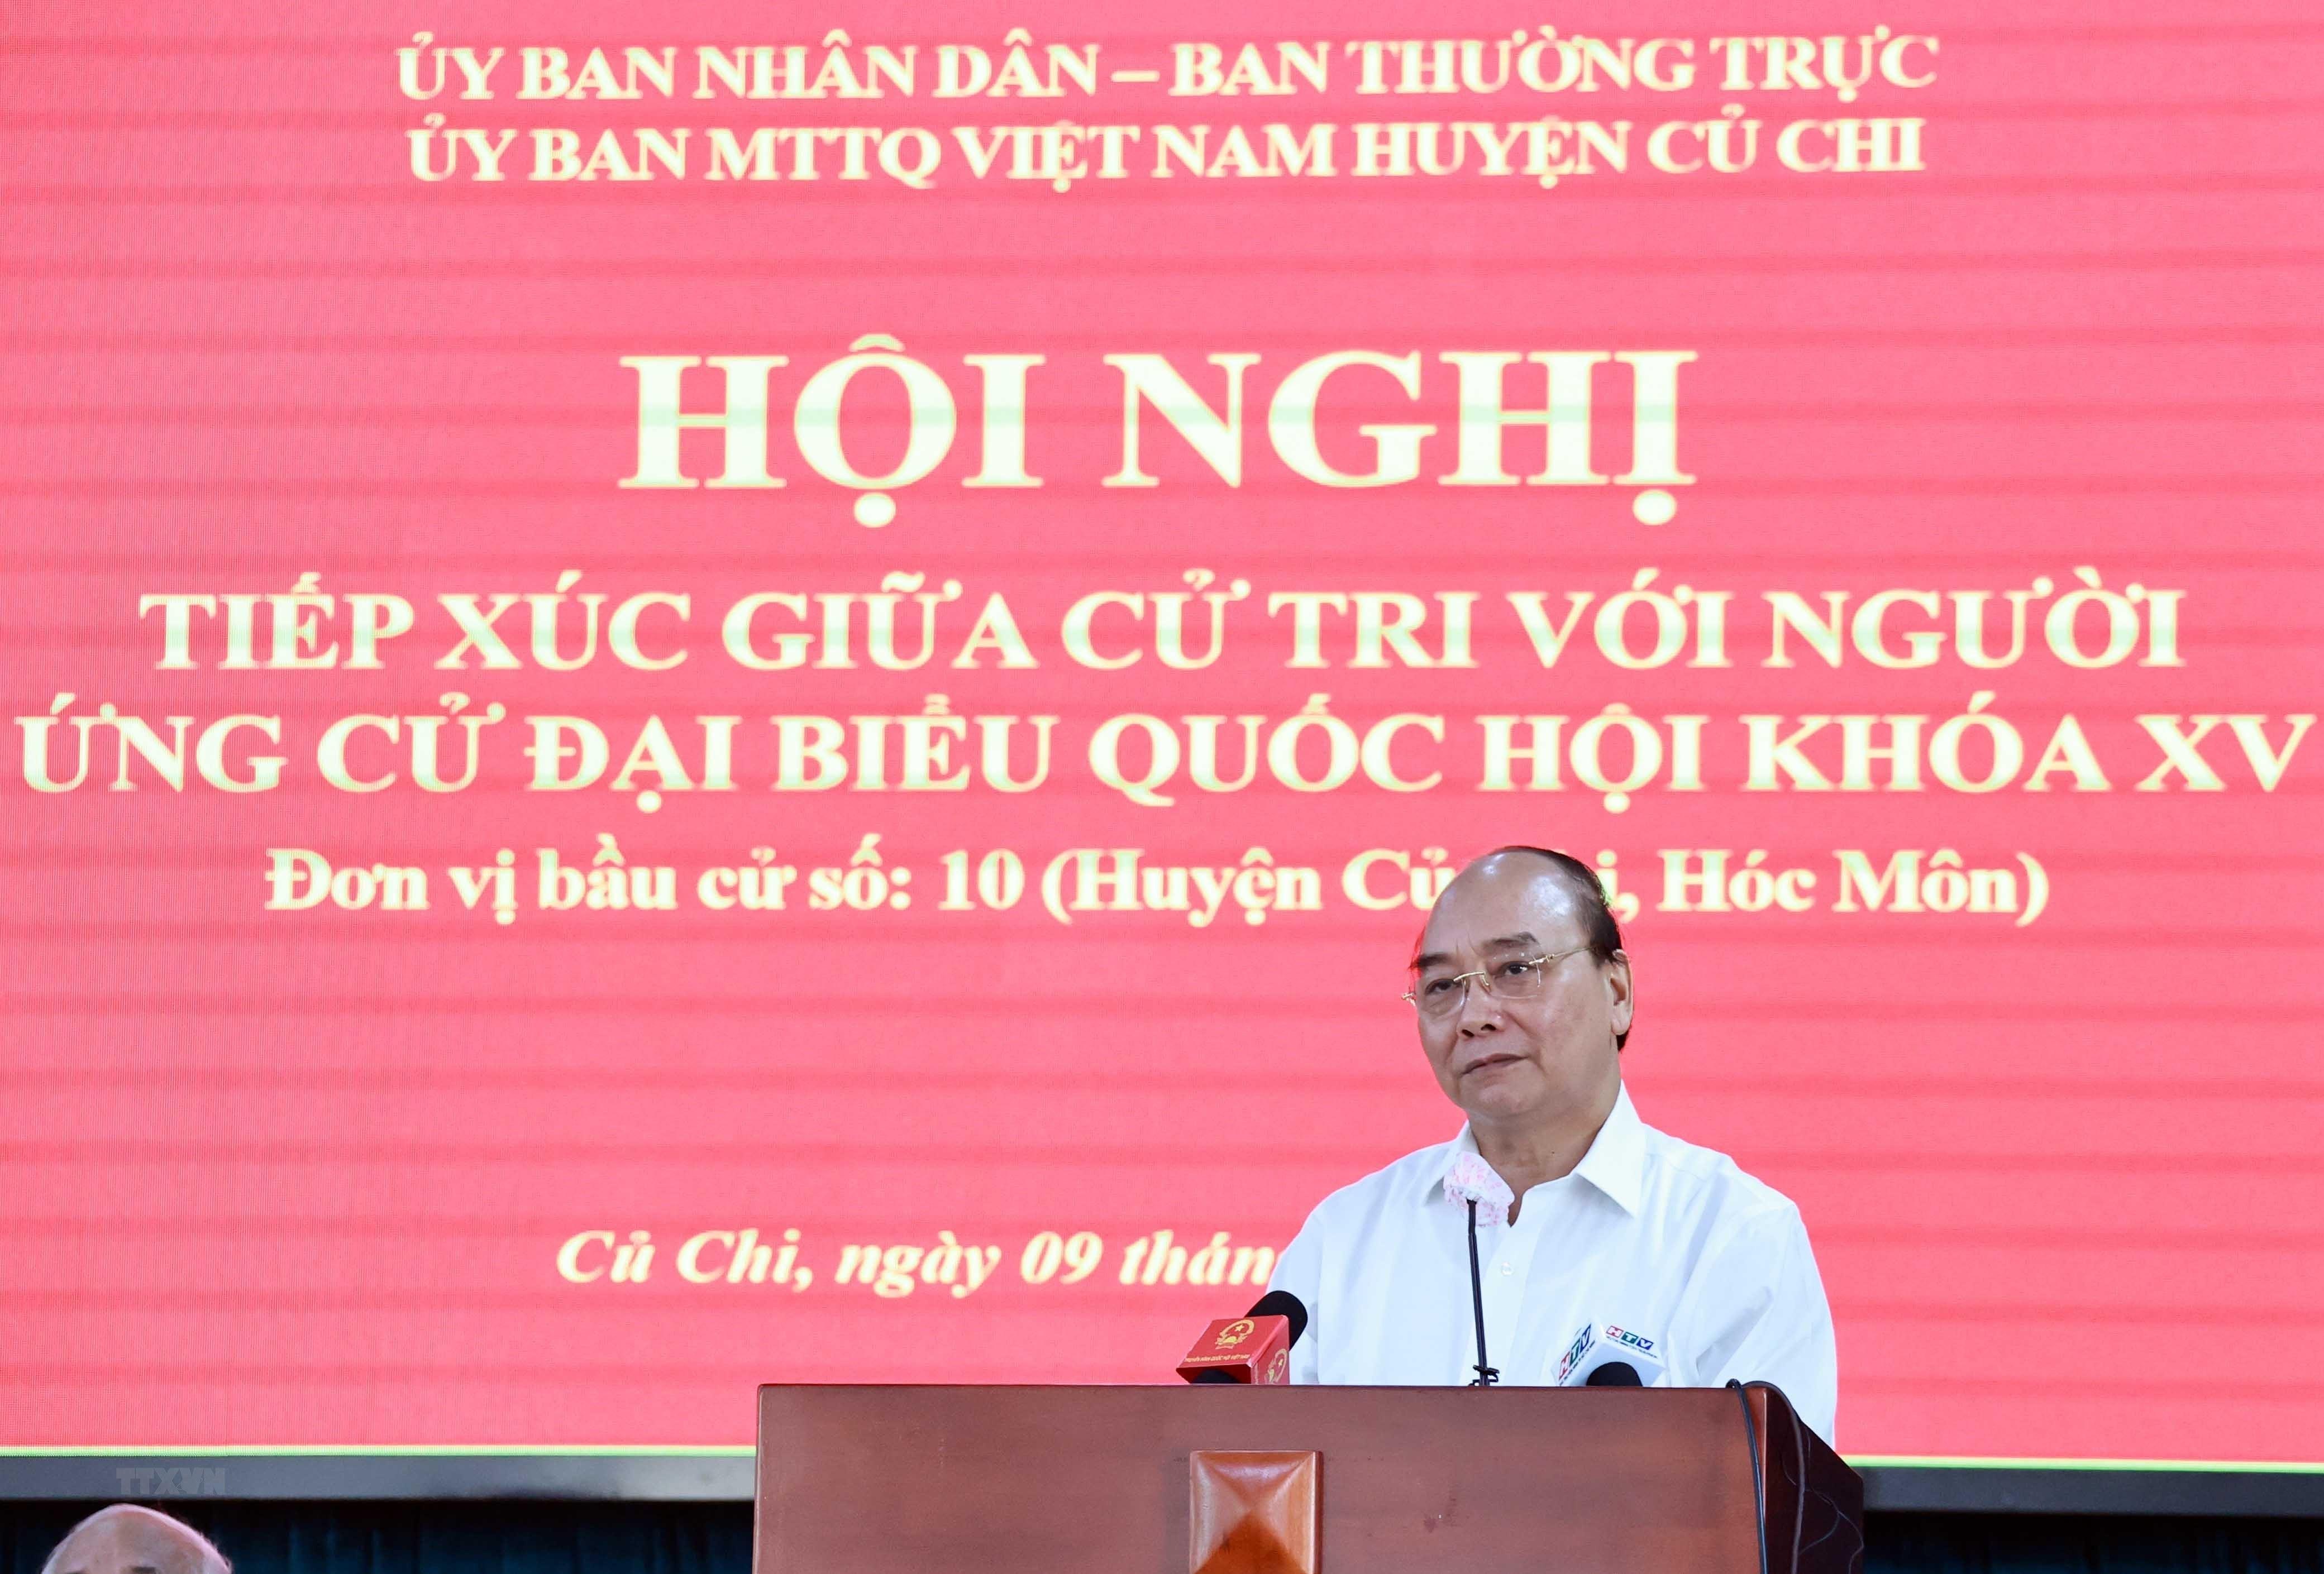 [Photo] Chu tich nuoc tiep xuc cu tri tai huyen Cu Chi va Hoc Mon hinh anh 7